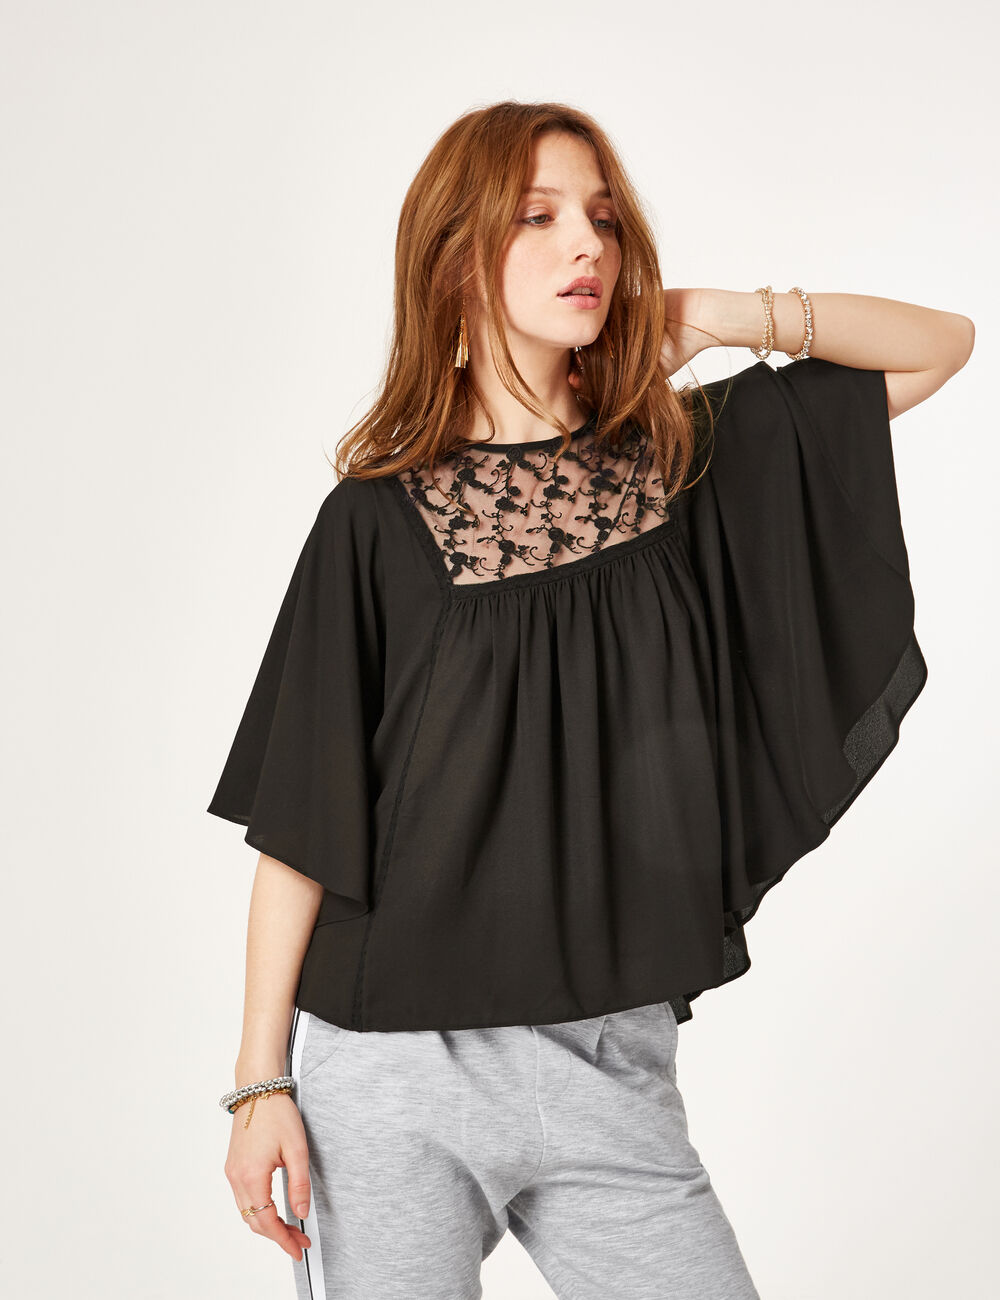 blouse avec dentelle noire femme jennyfer. Black Bedroom Furniture Sets. Home Design Ideas